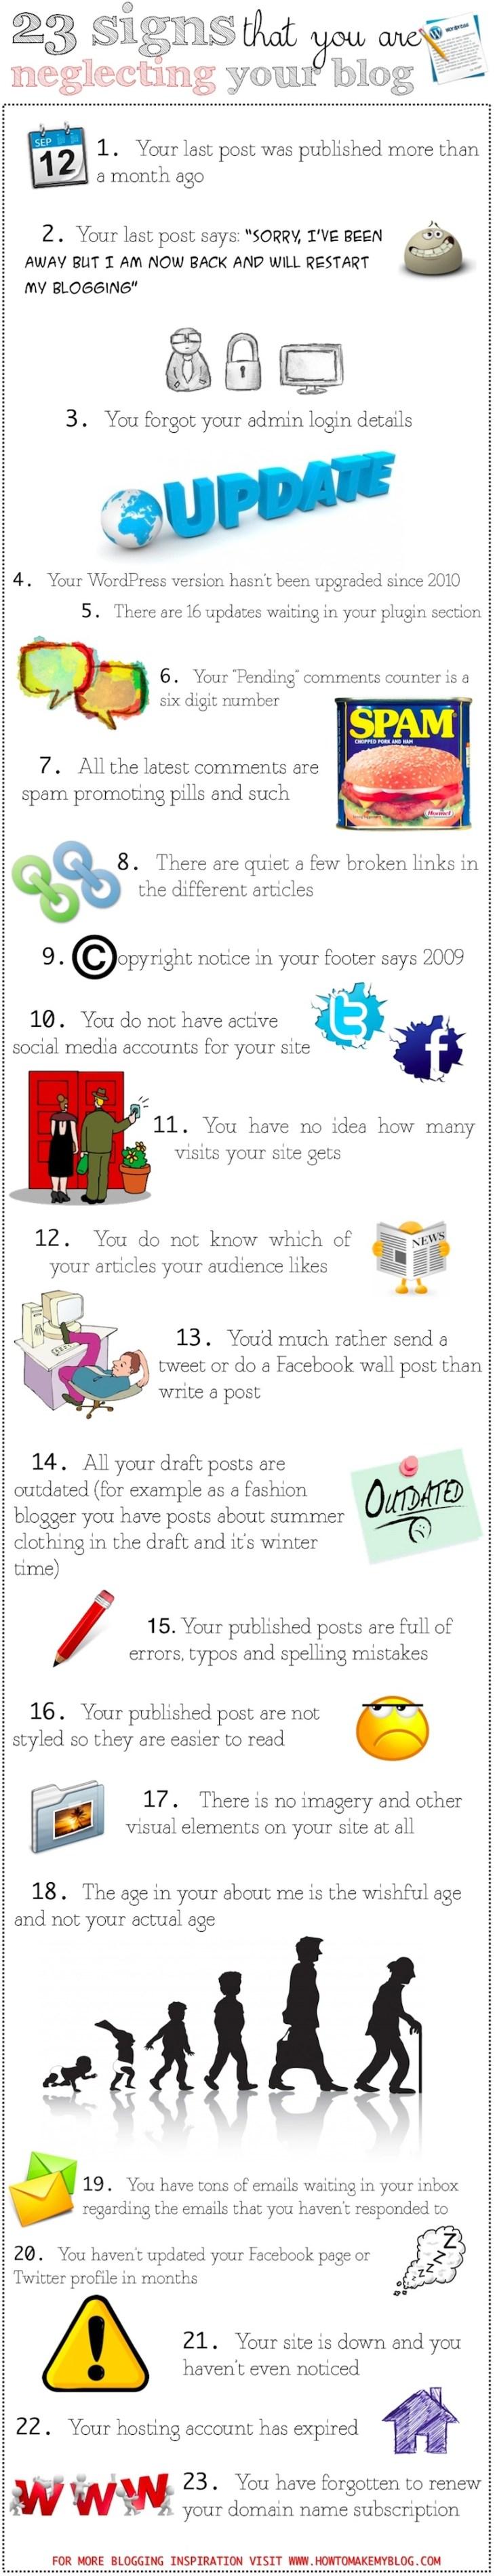 Blog neglect infographic